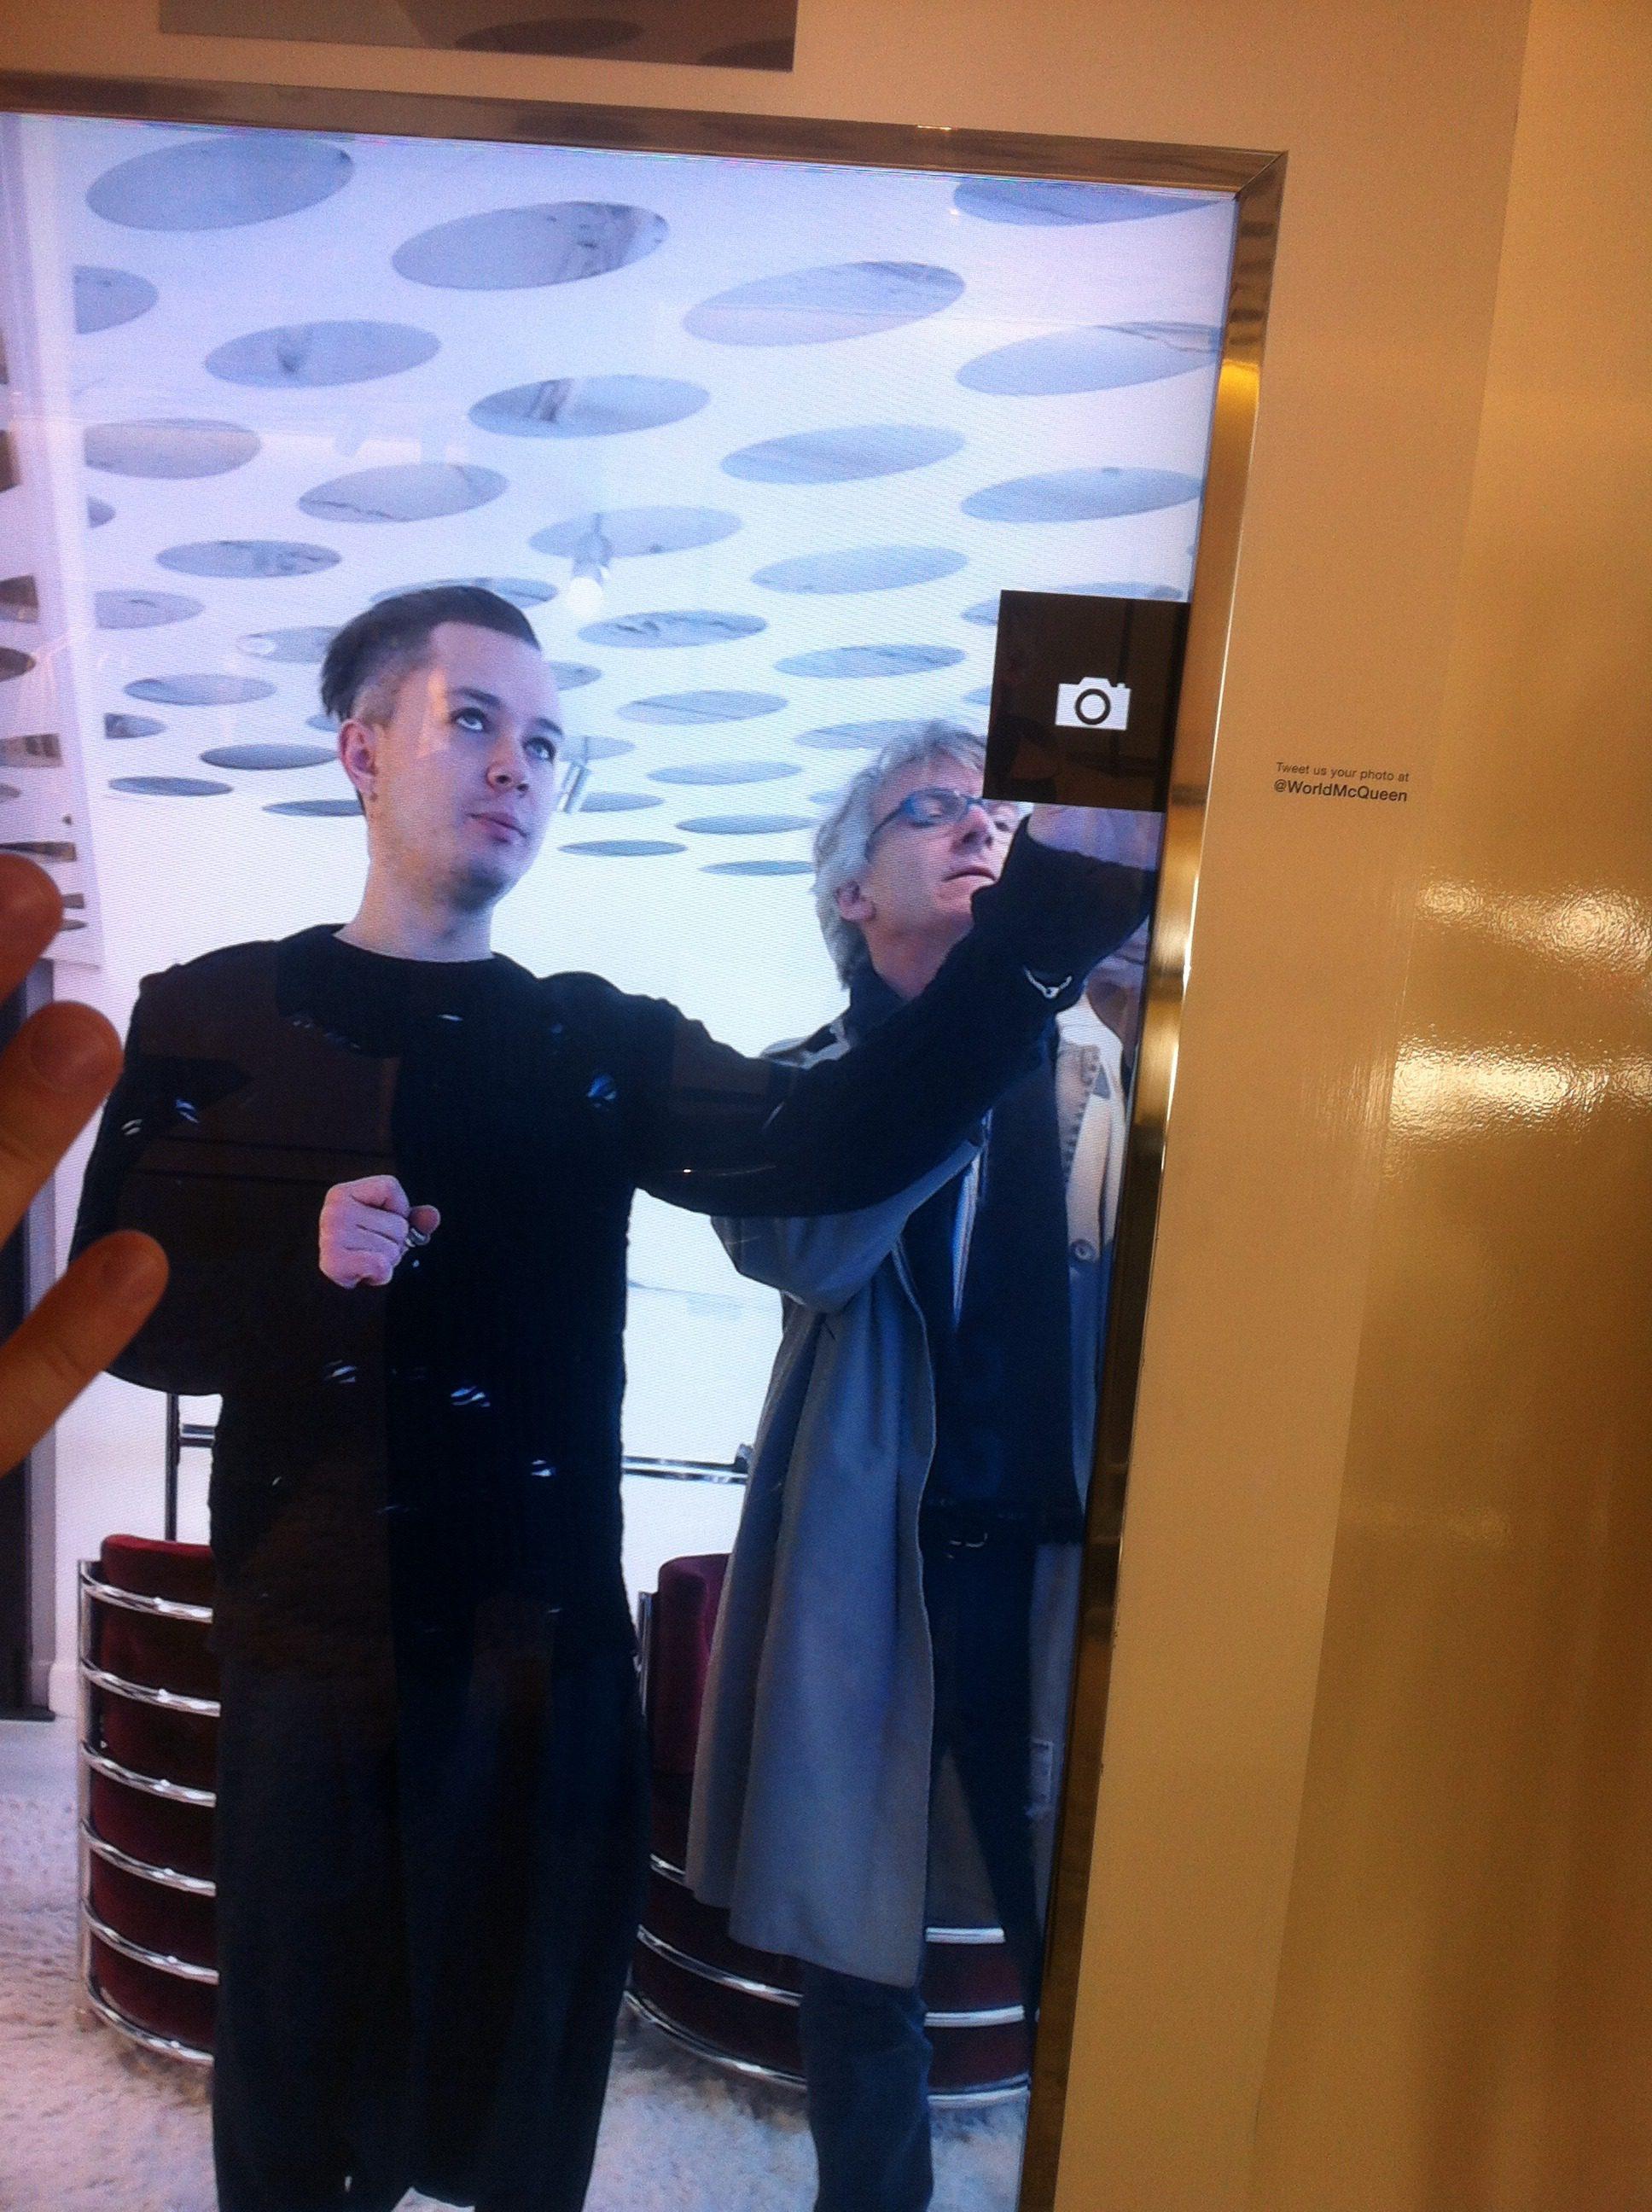 Alexander McQueen, Interactive Mirror on The Myndset Brand Strategy